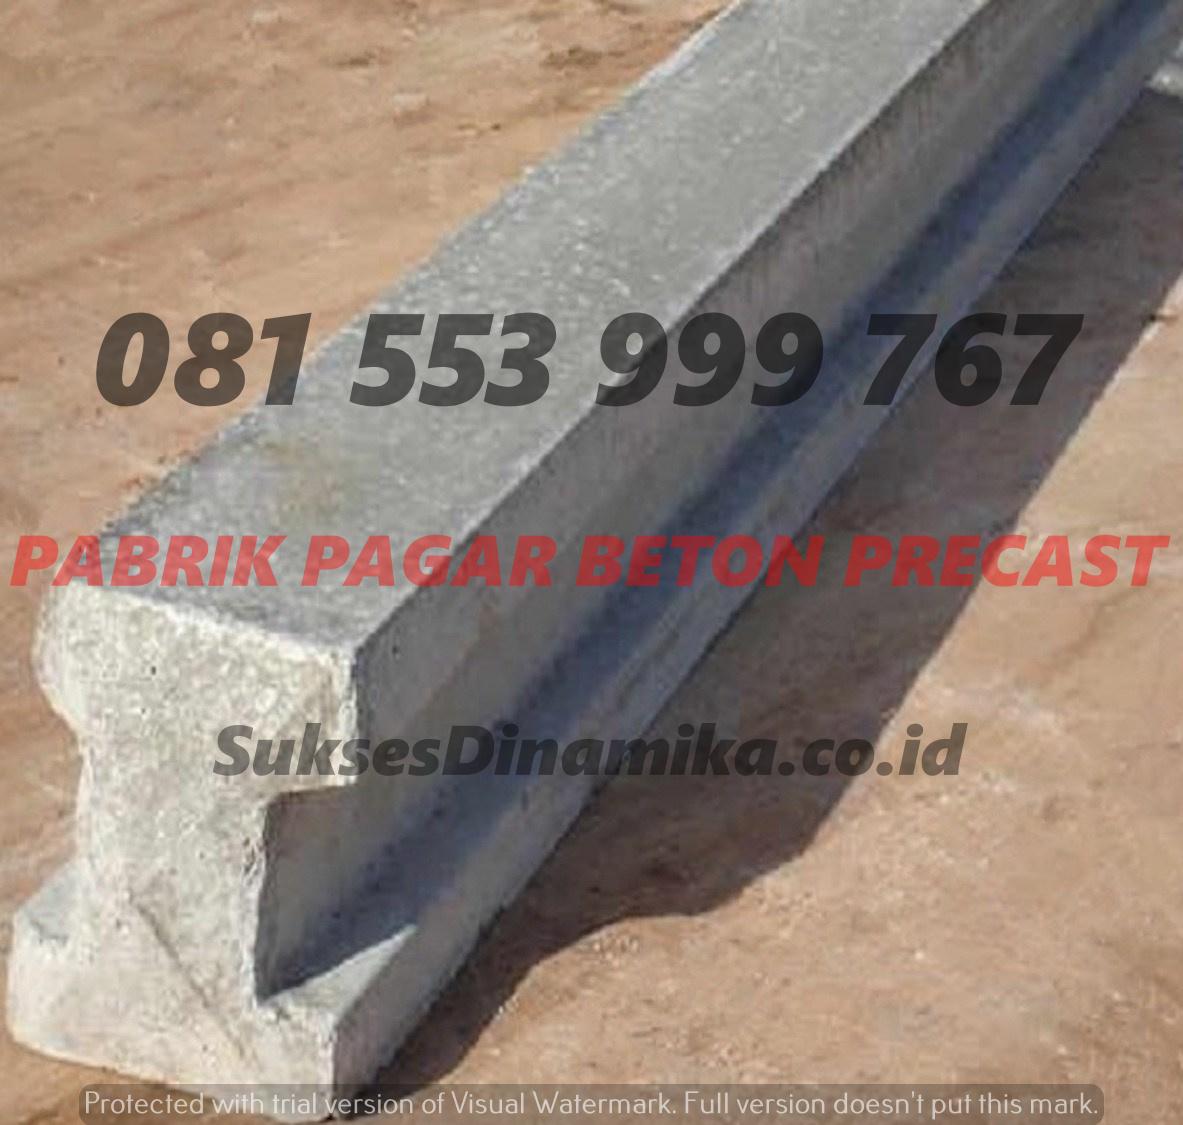 Harga Pagar Panel Beton Per Meter Pasuruan, Pagar Beton Taman